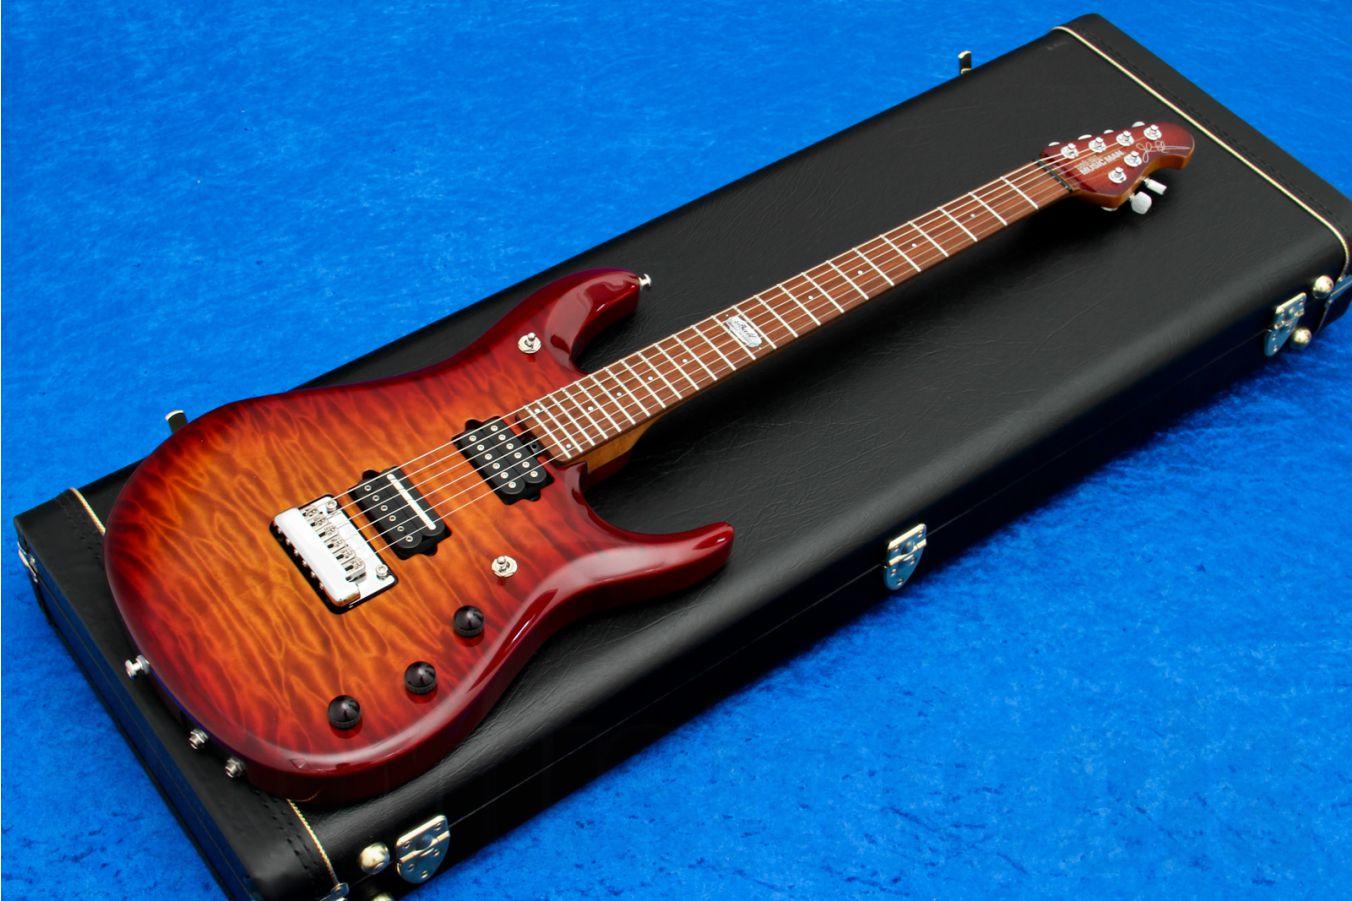 Music Man USA John Petrucci JP6 BFR QT CH - PDN Honey Roasted Limited Edition